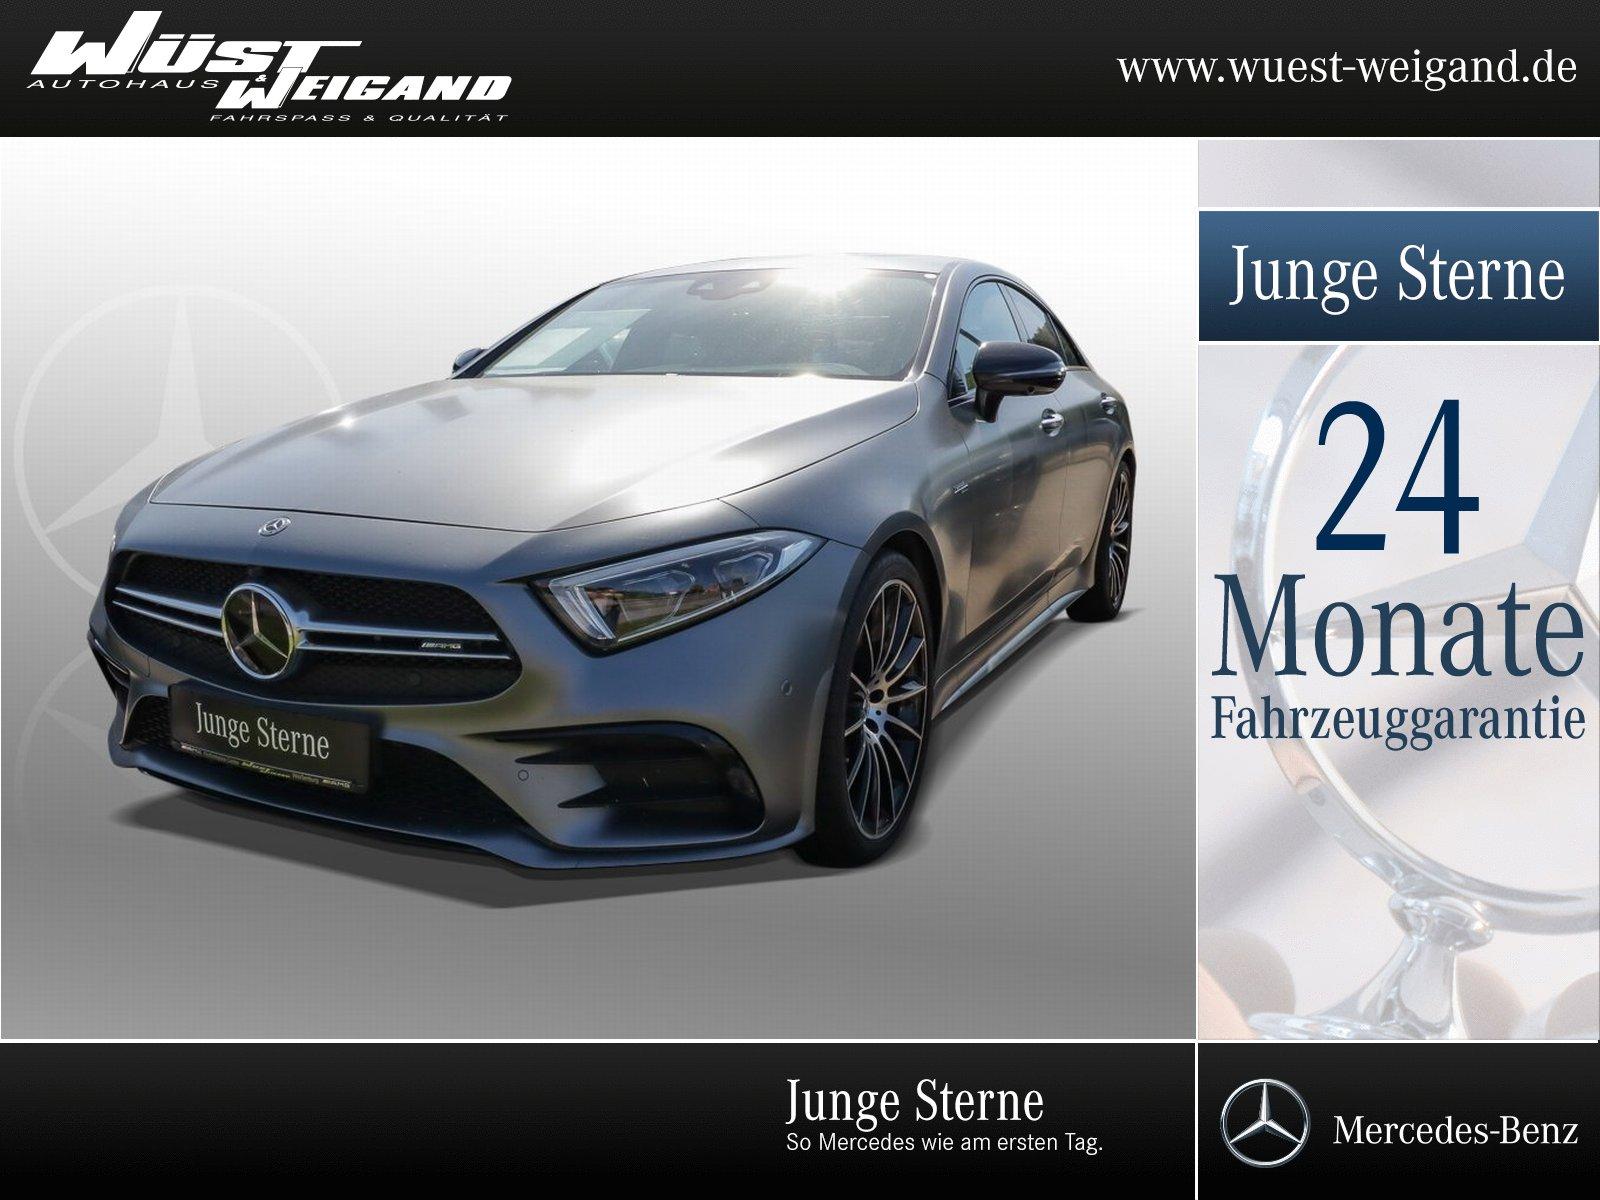 Mercedes-Benz CLS 53 AMG 4M+ Distronic+HUD+360°+LED+, Jahr 2019, Benzin